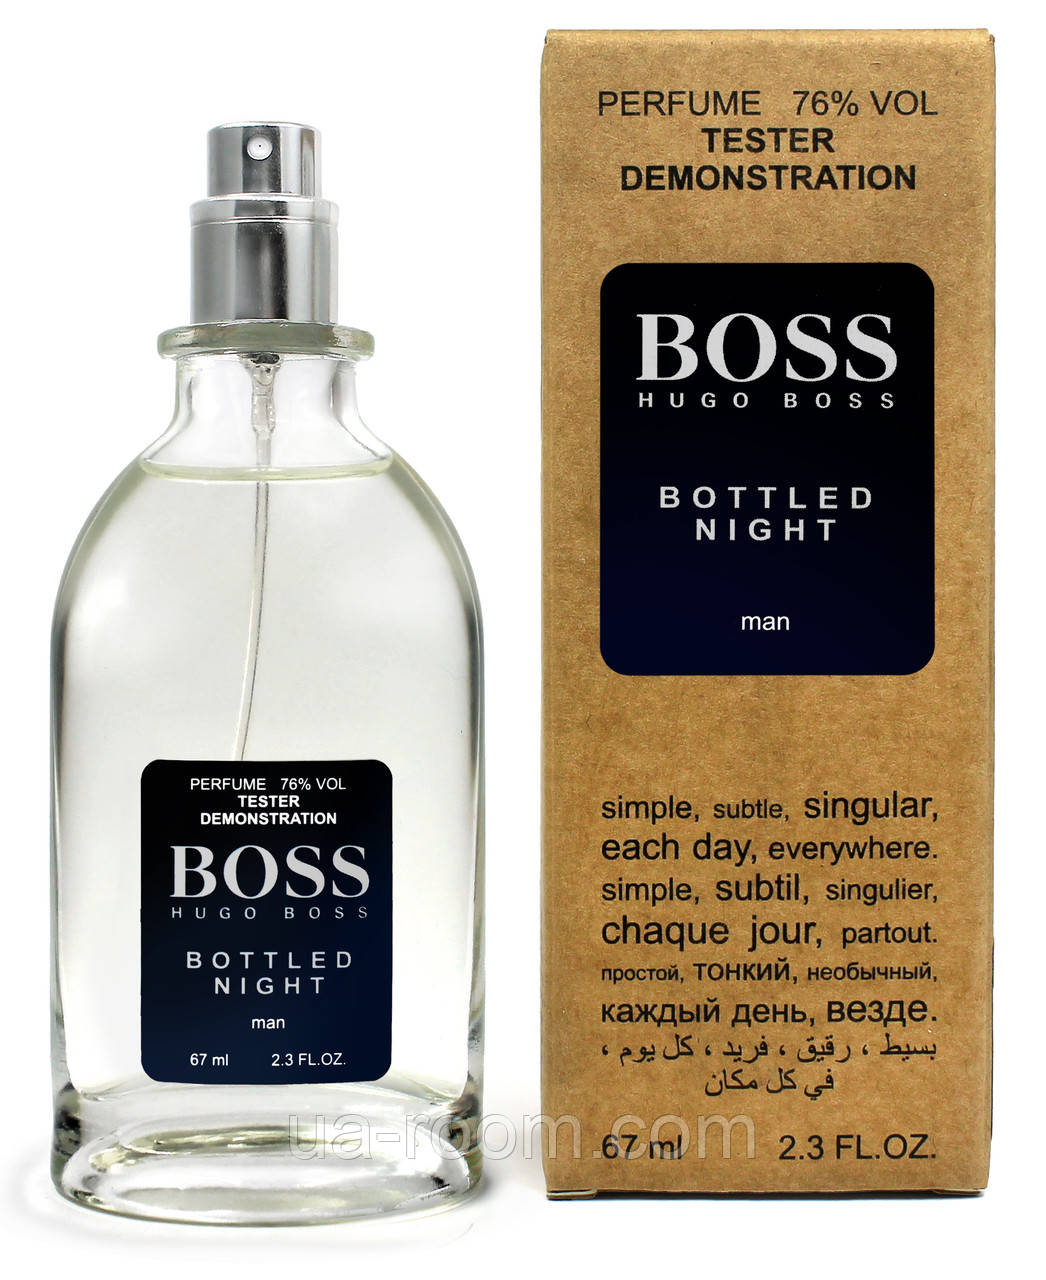 Тестер мужской Hugo Boss Boss Bottled Night, 67 мл.